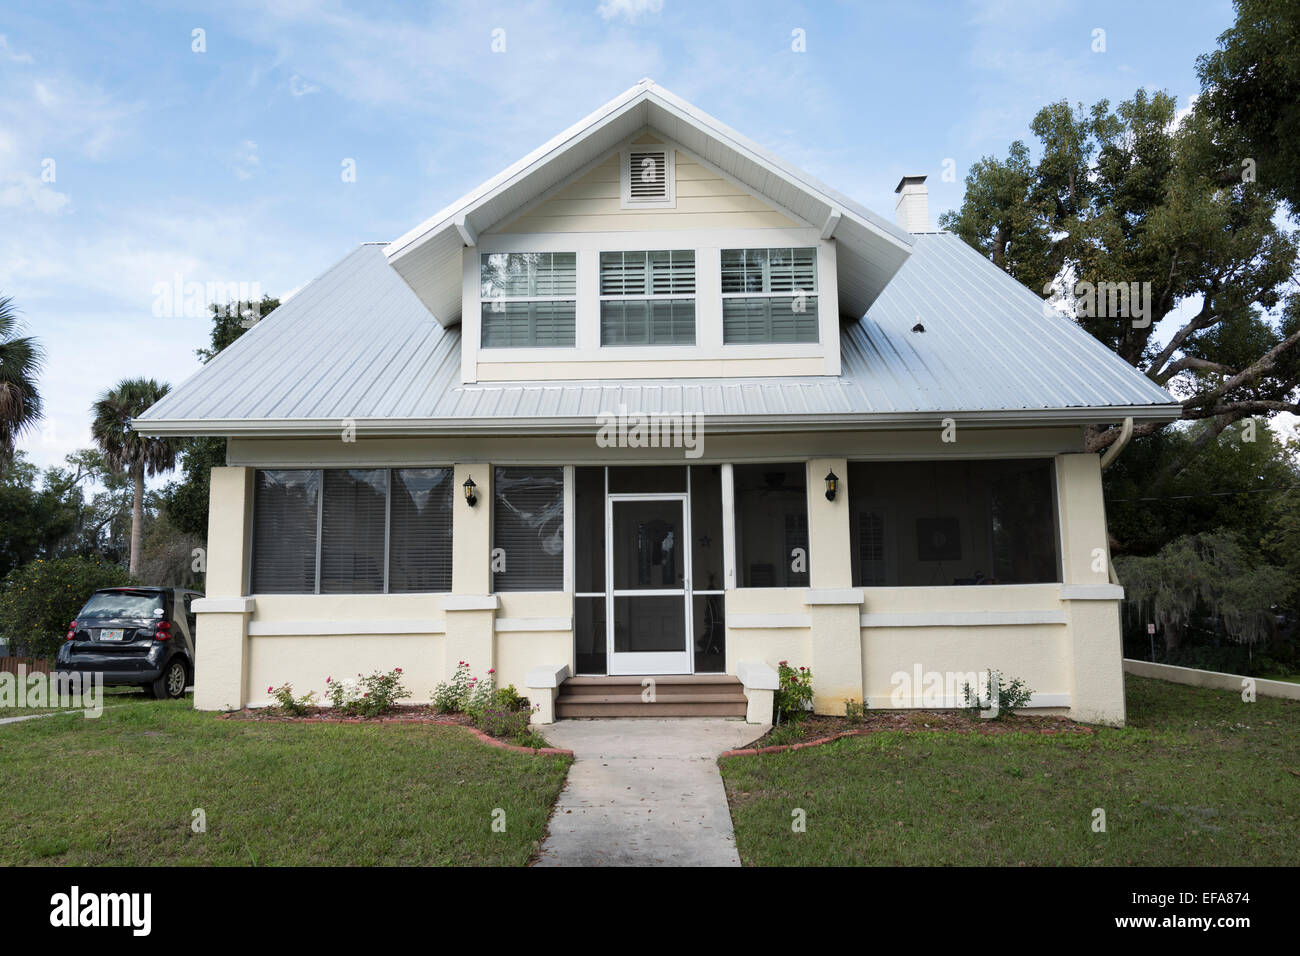 Typical Florida House, Clermont, Lake County, Florida, USA - Stock Image